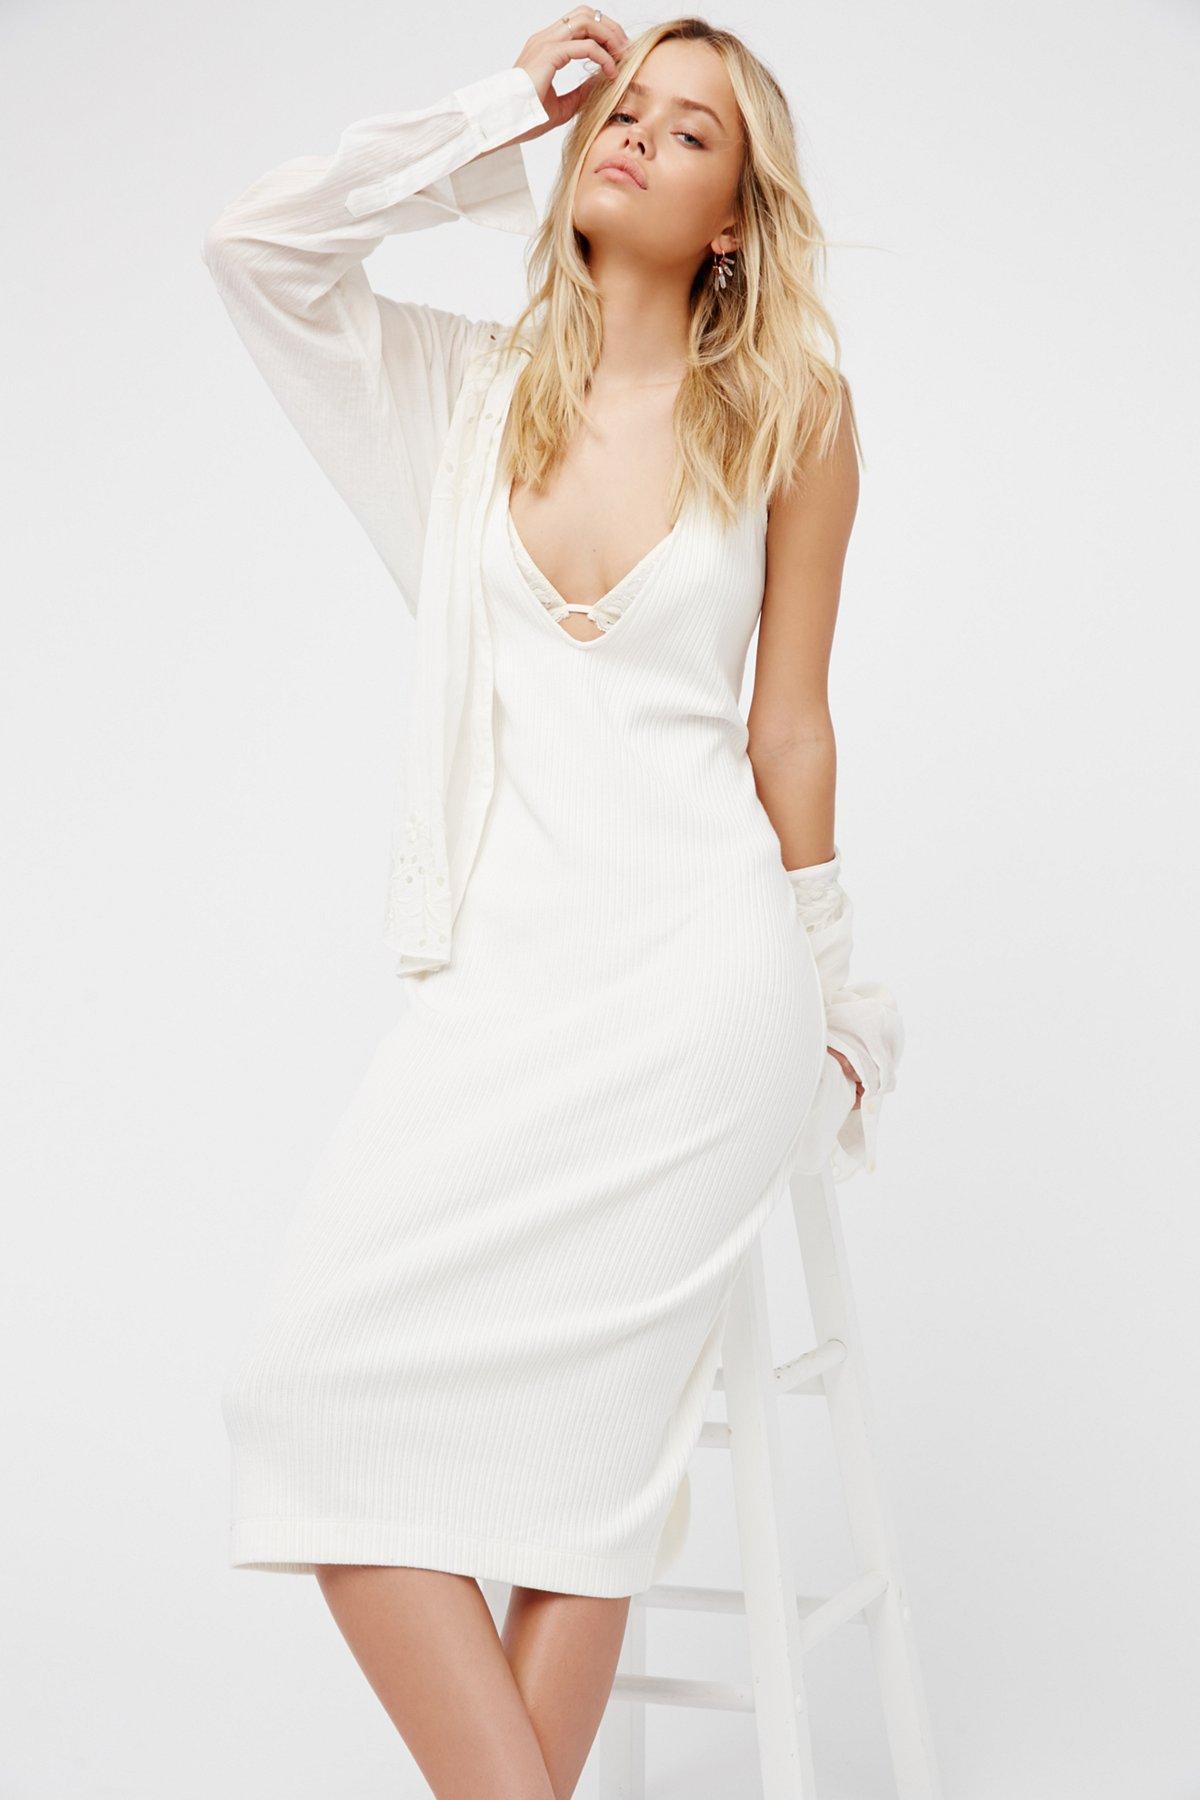 Hubba Hubba Midi Dress